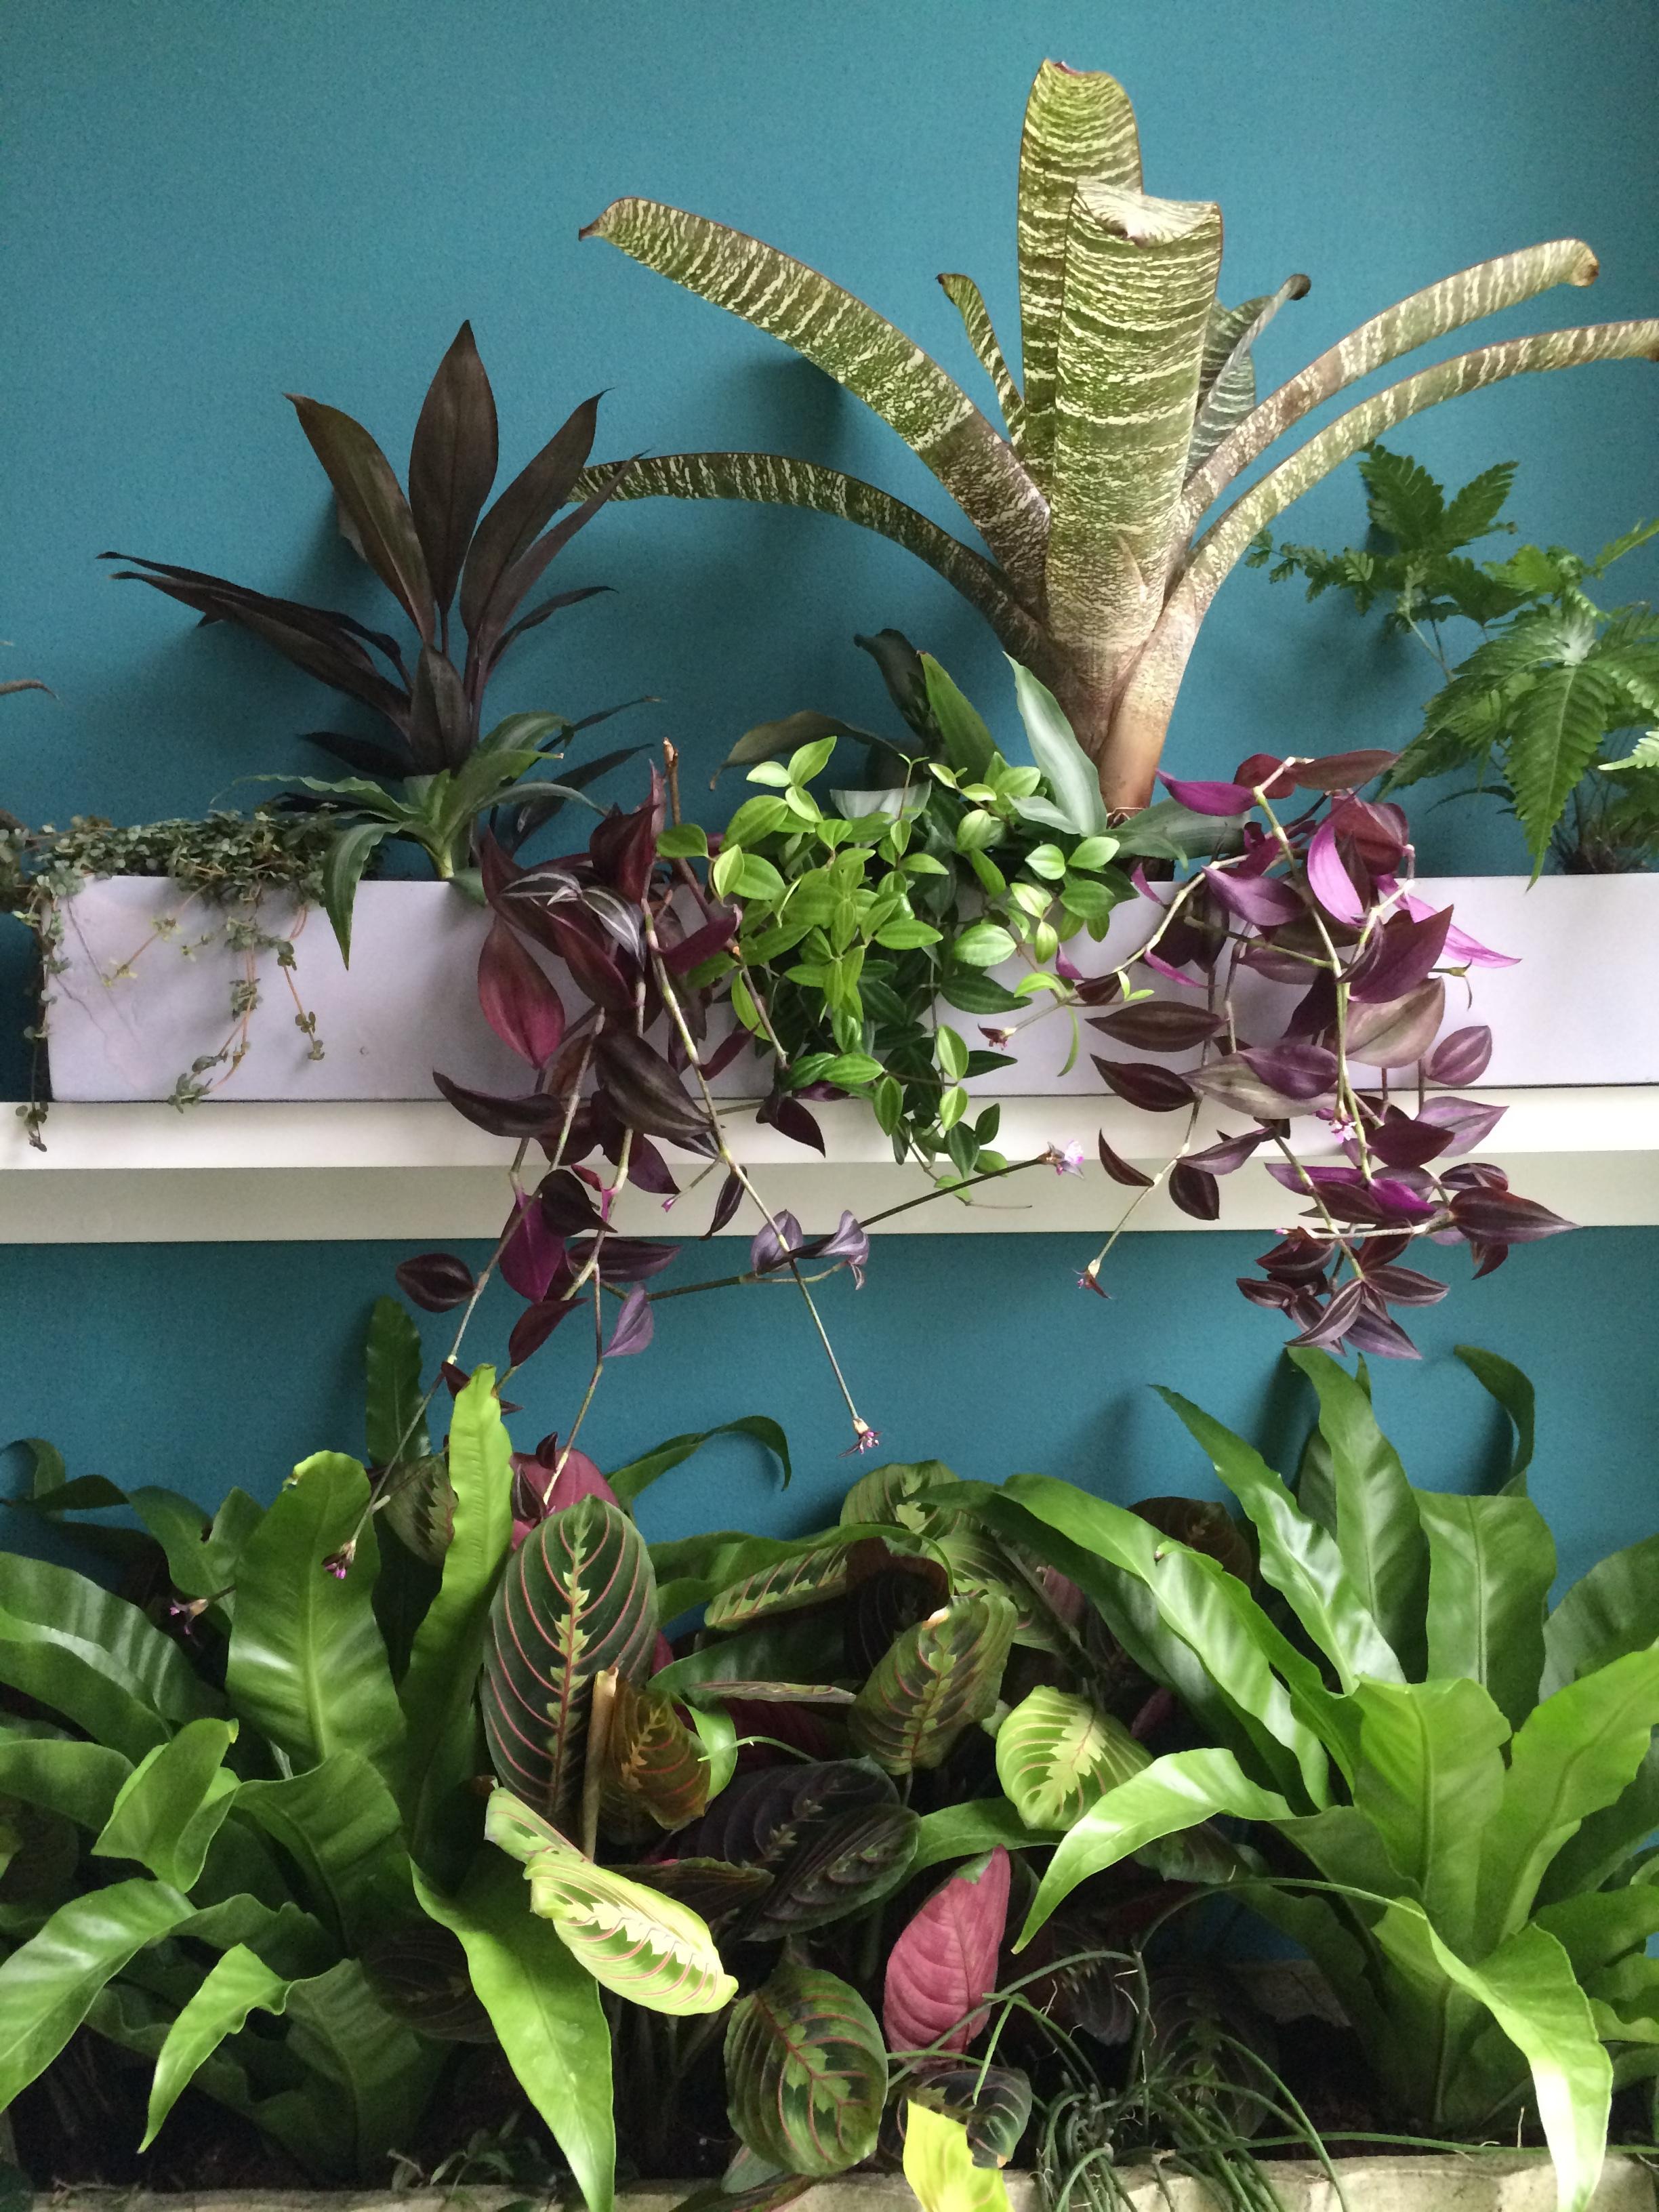 Marantas and ferns on the shelves